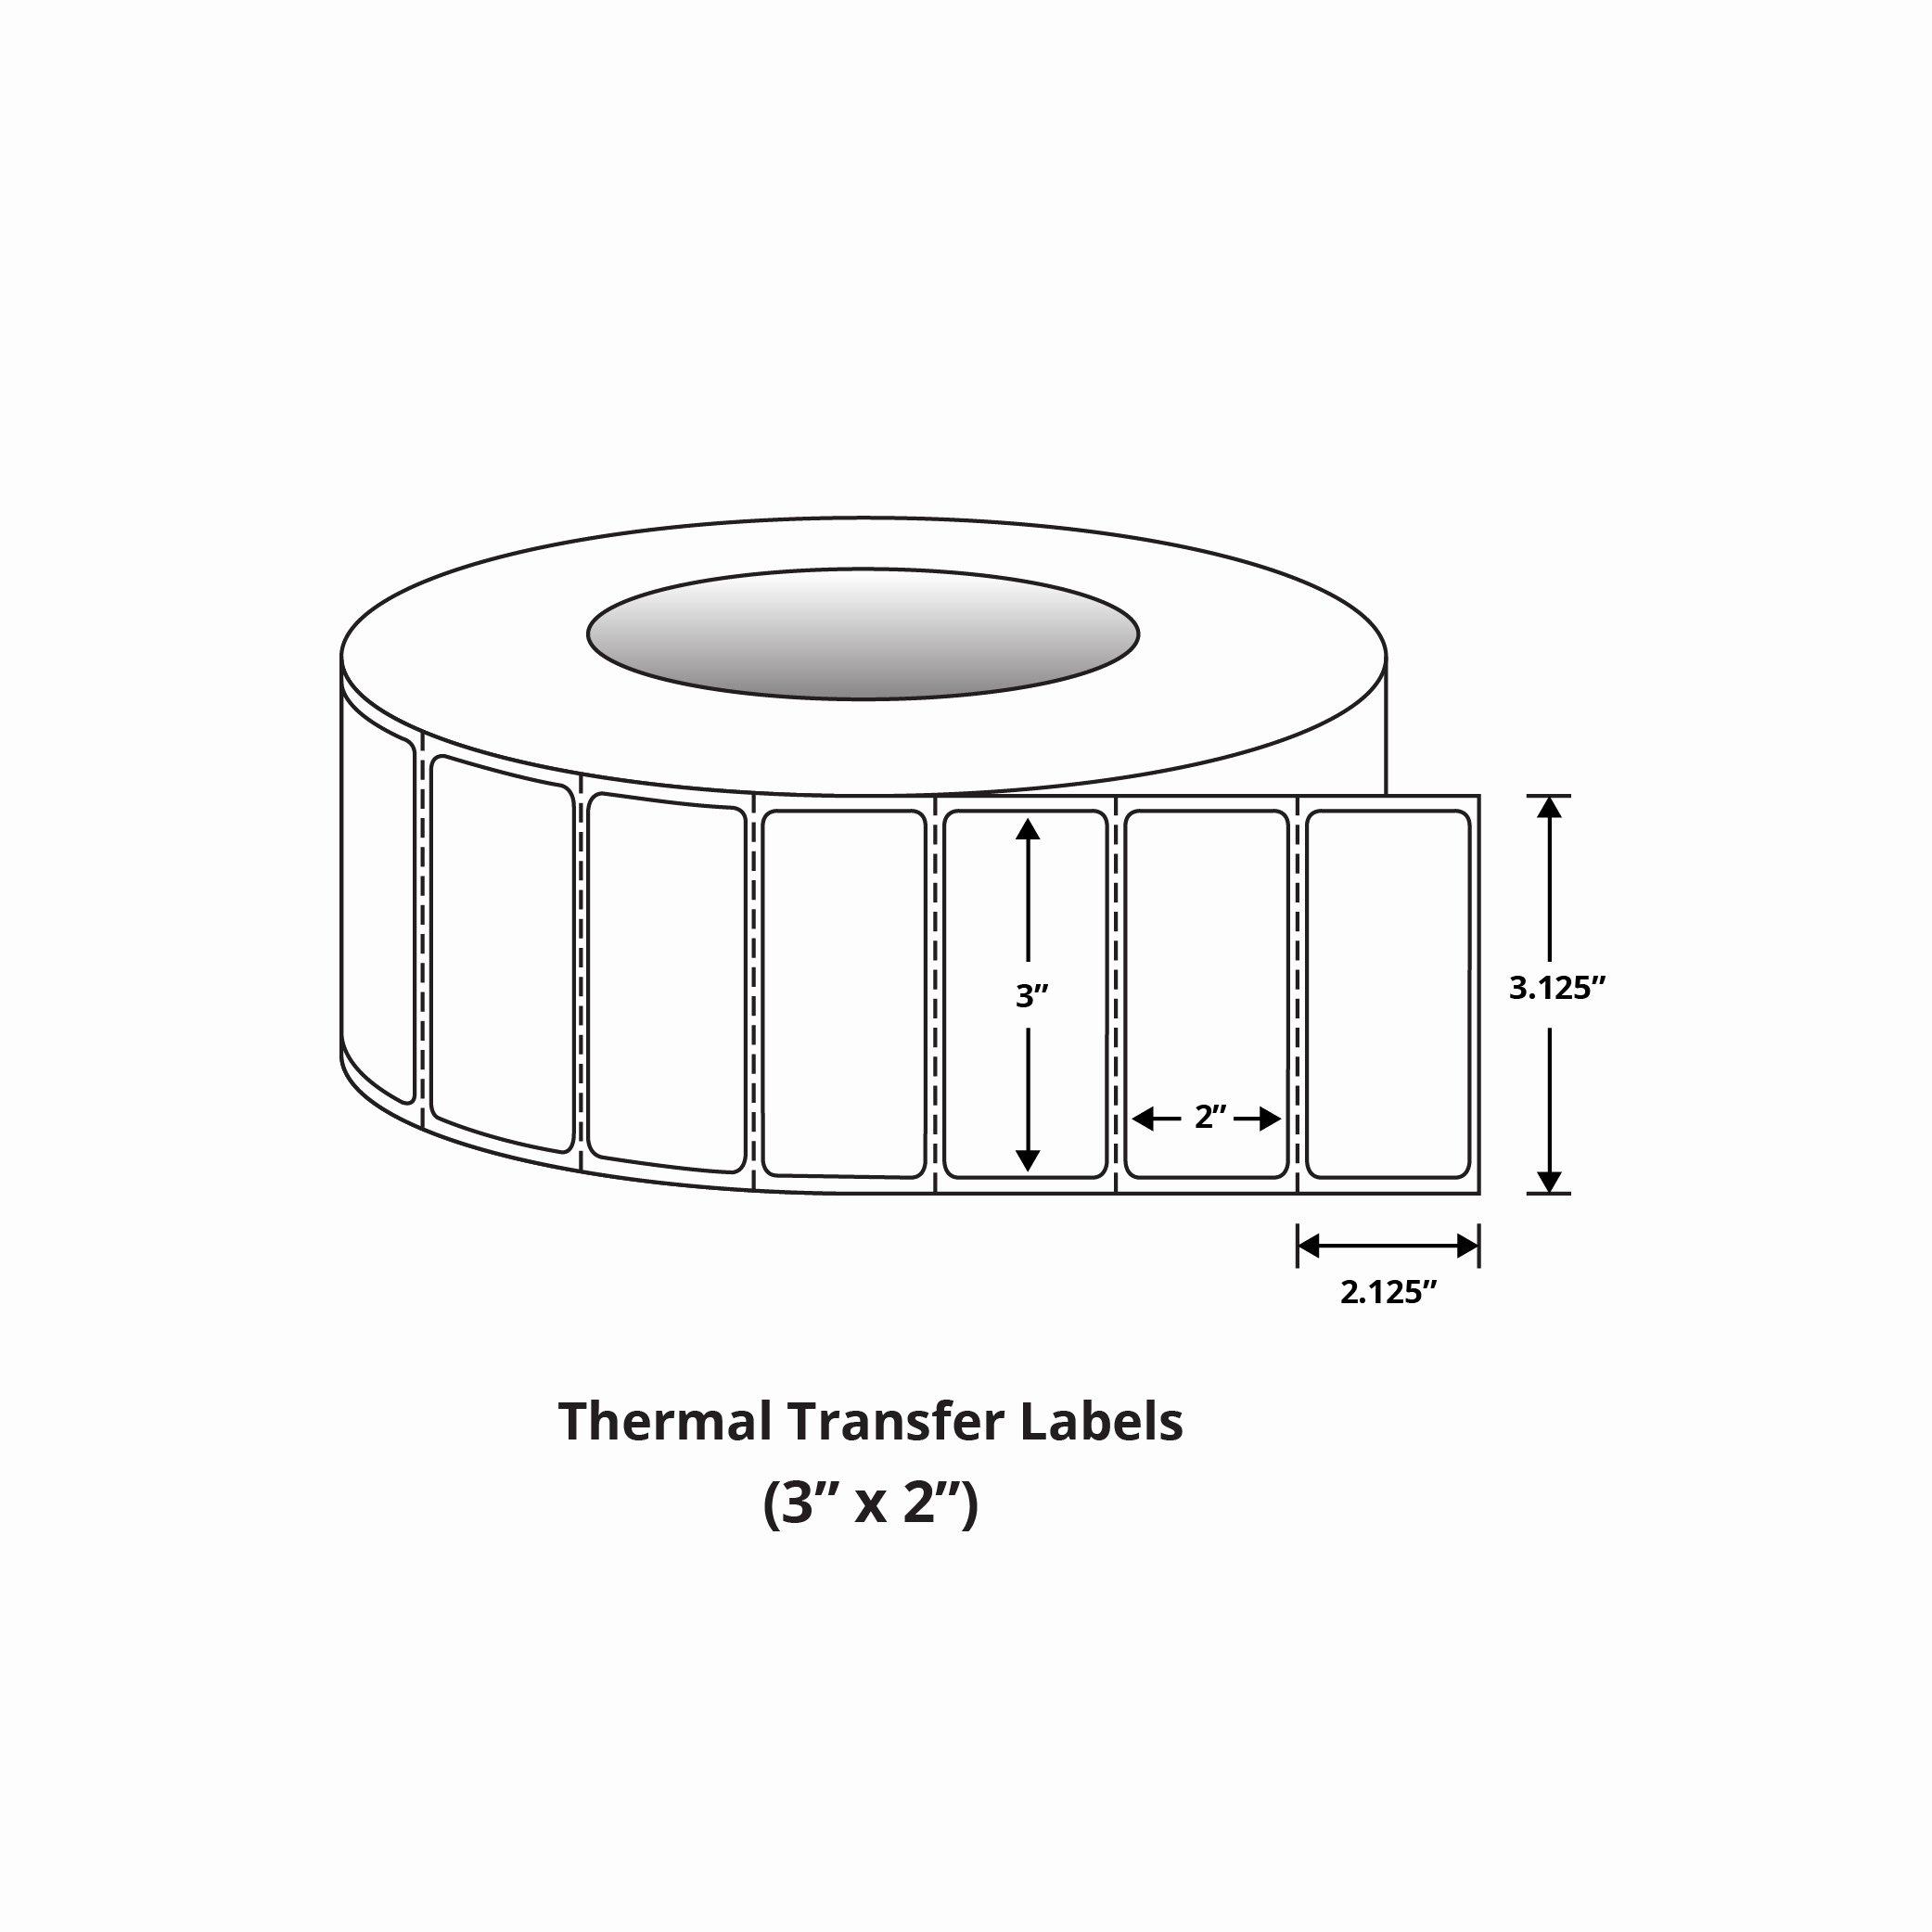 "Uline Premium Laser Labels Lovely Premium 3"" X 2"" thermal Transfer Labels"